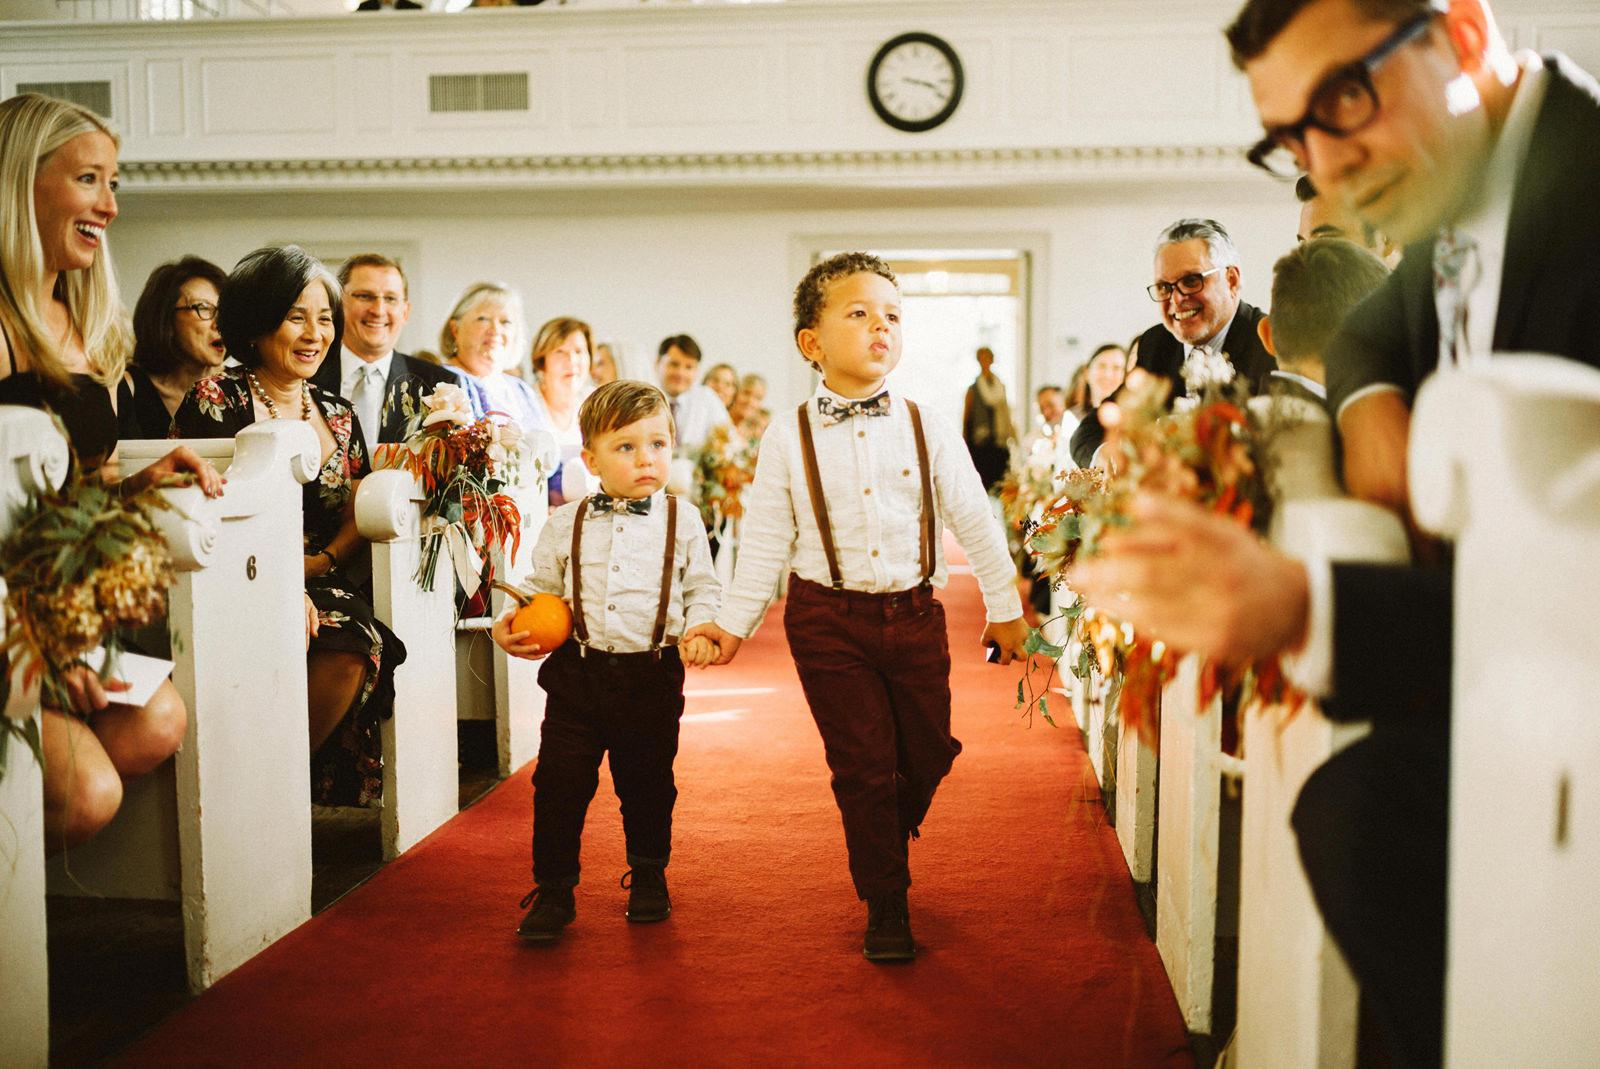 bridgeport-wedding-044 BRIDGEPORT, CONNECTICUT BACKYARD WEDDING